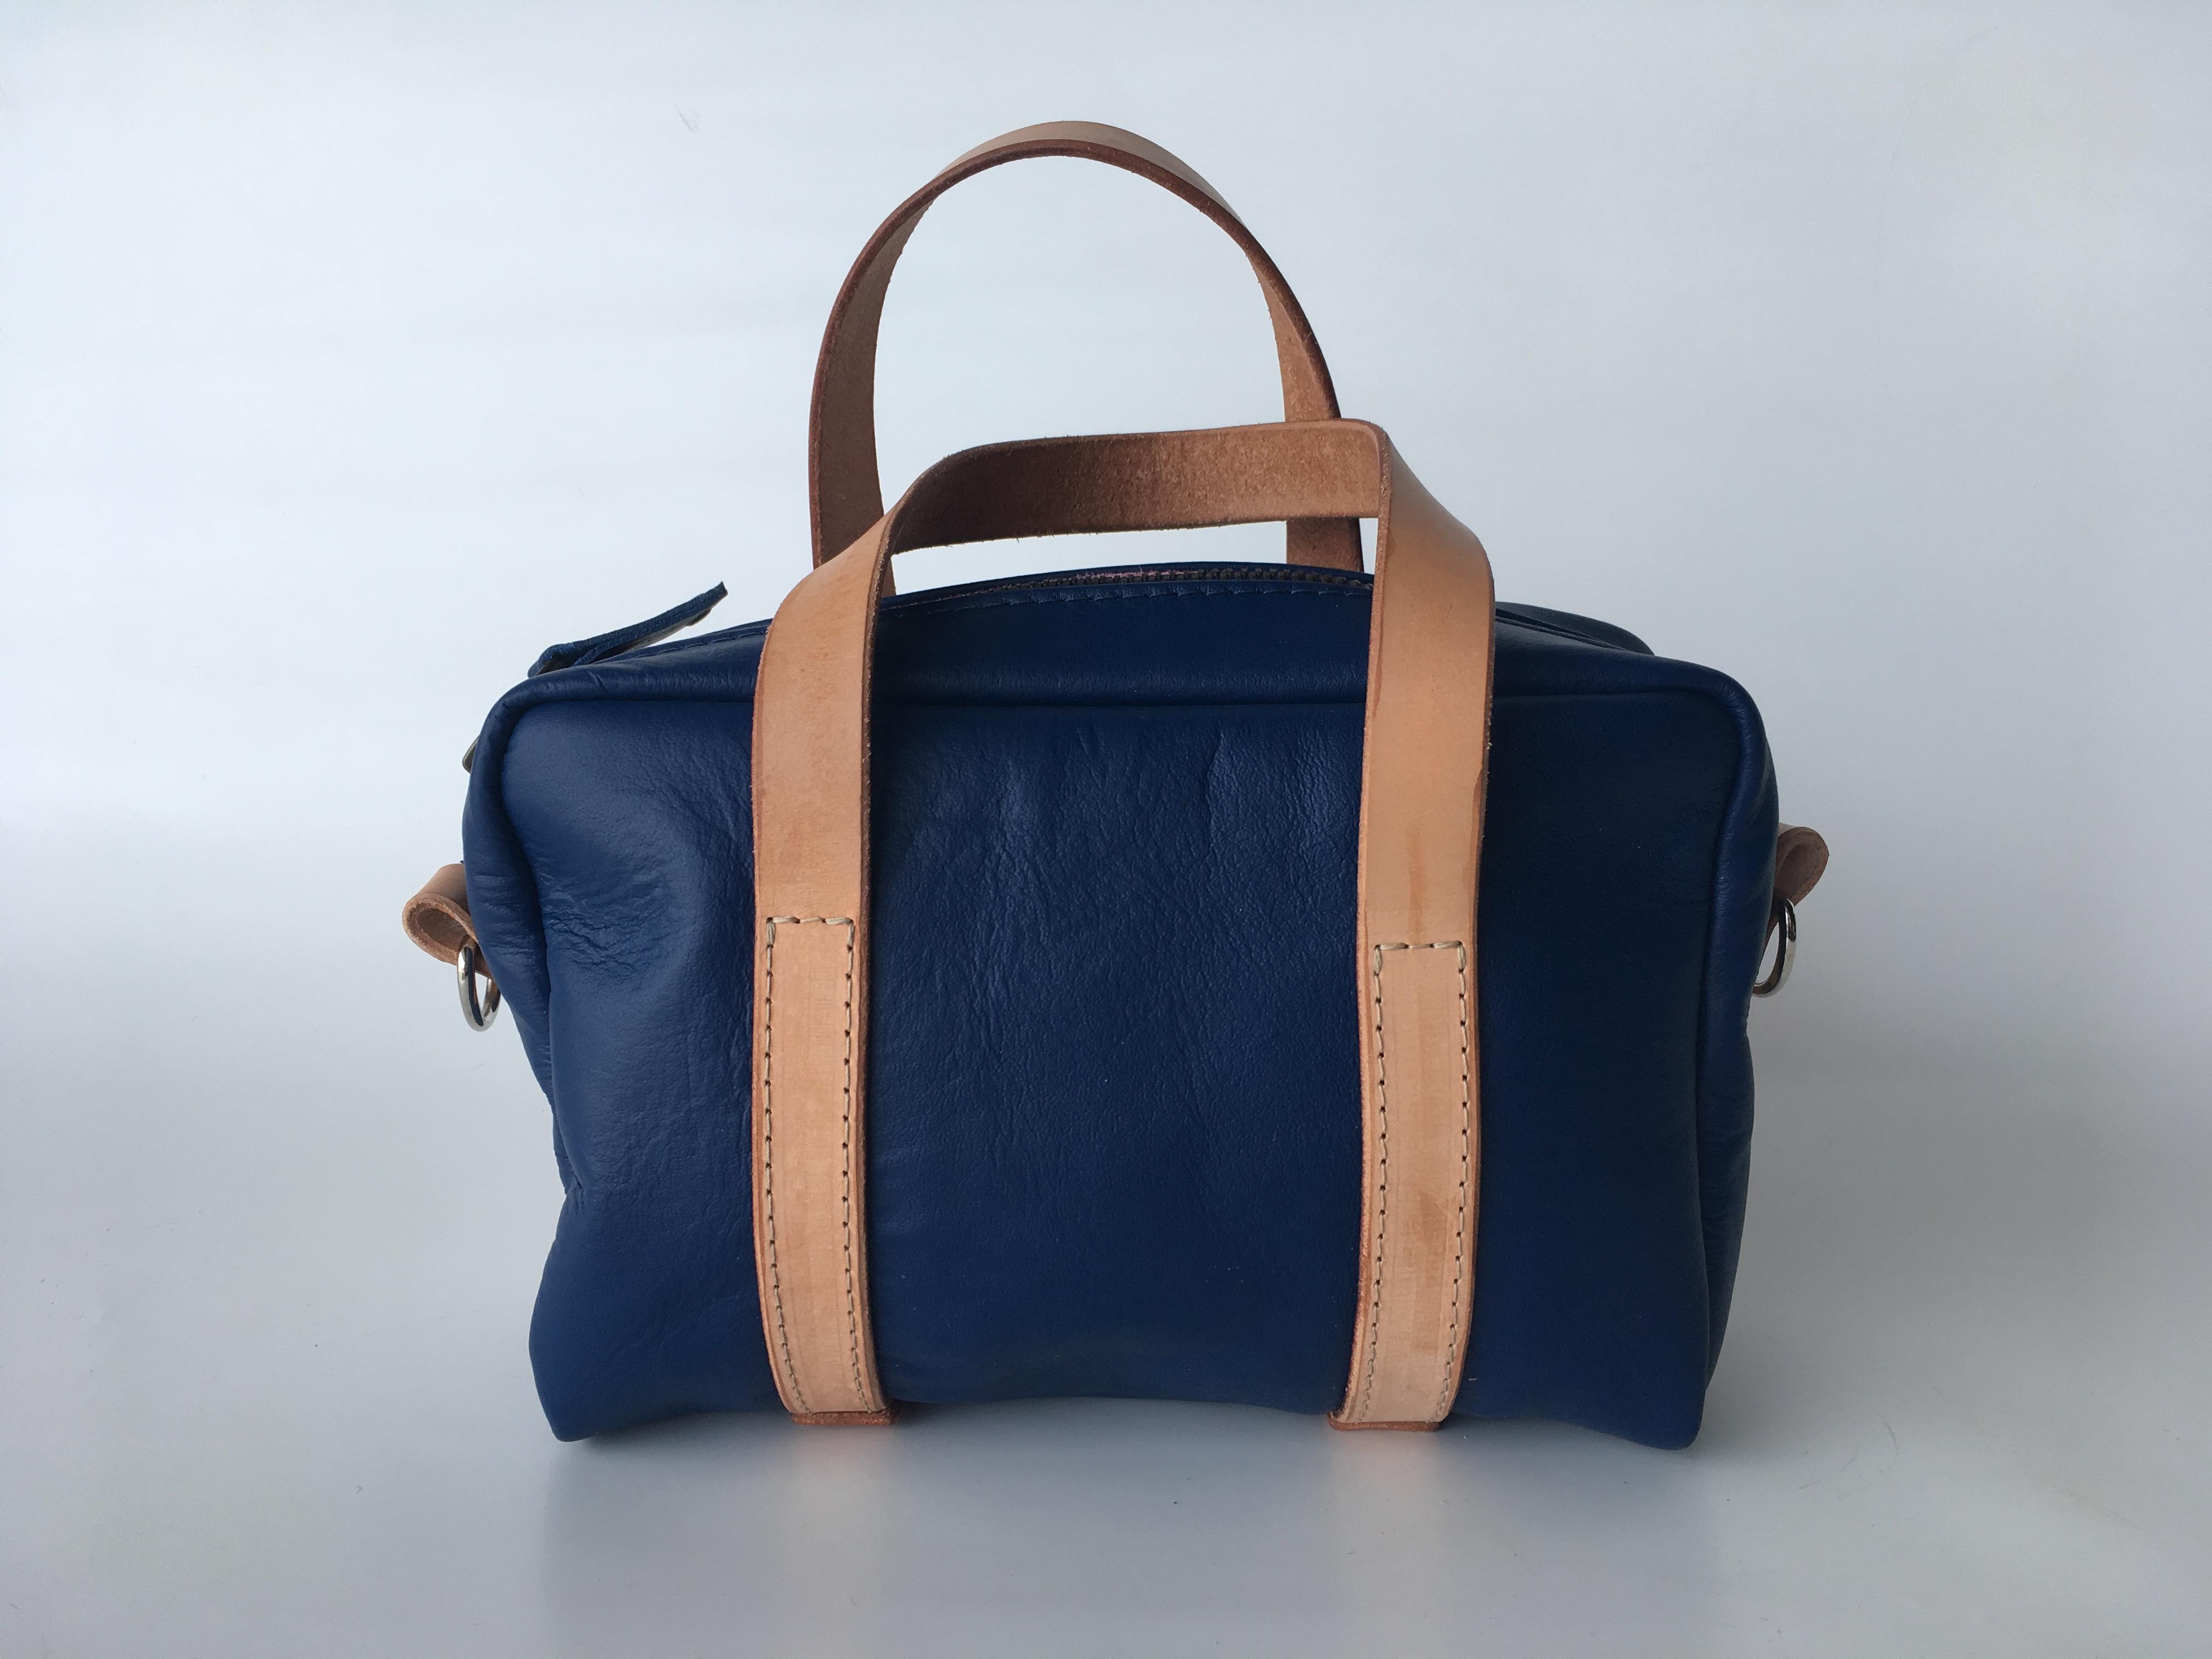 Blue kangaroo leather Mini Duffel bag with natural straps